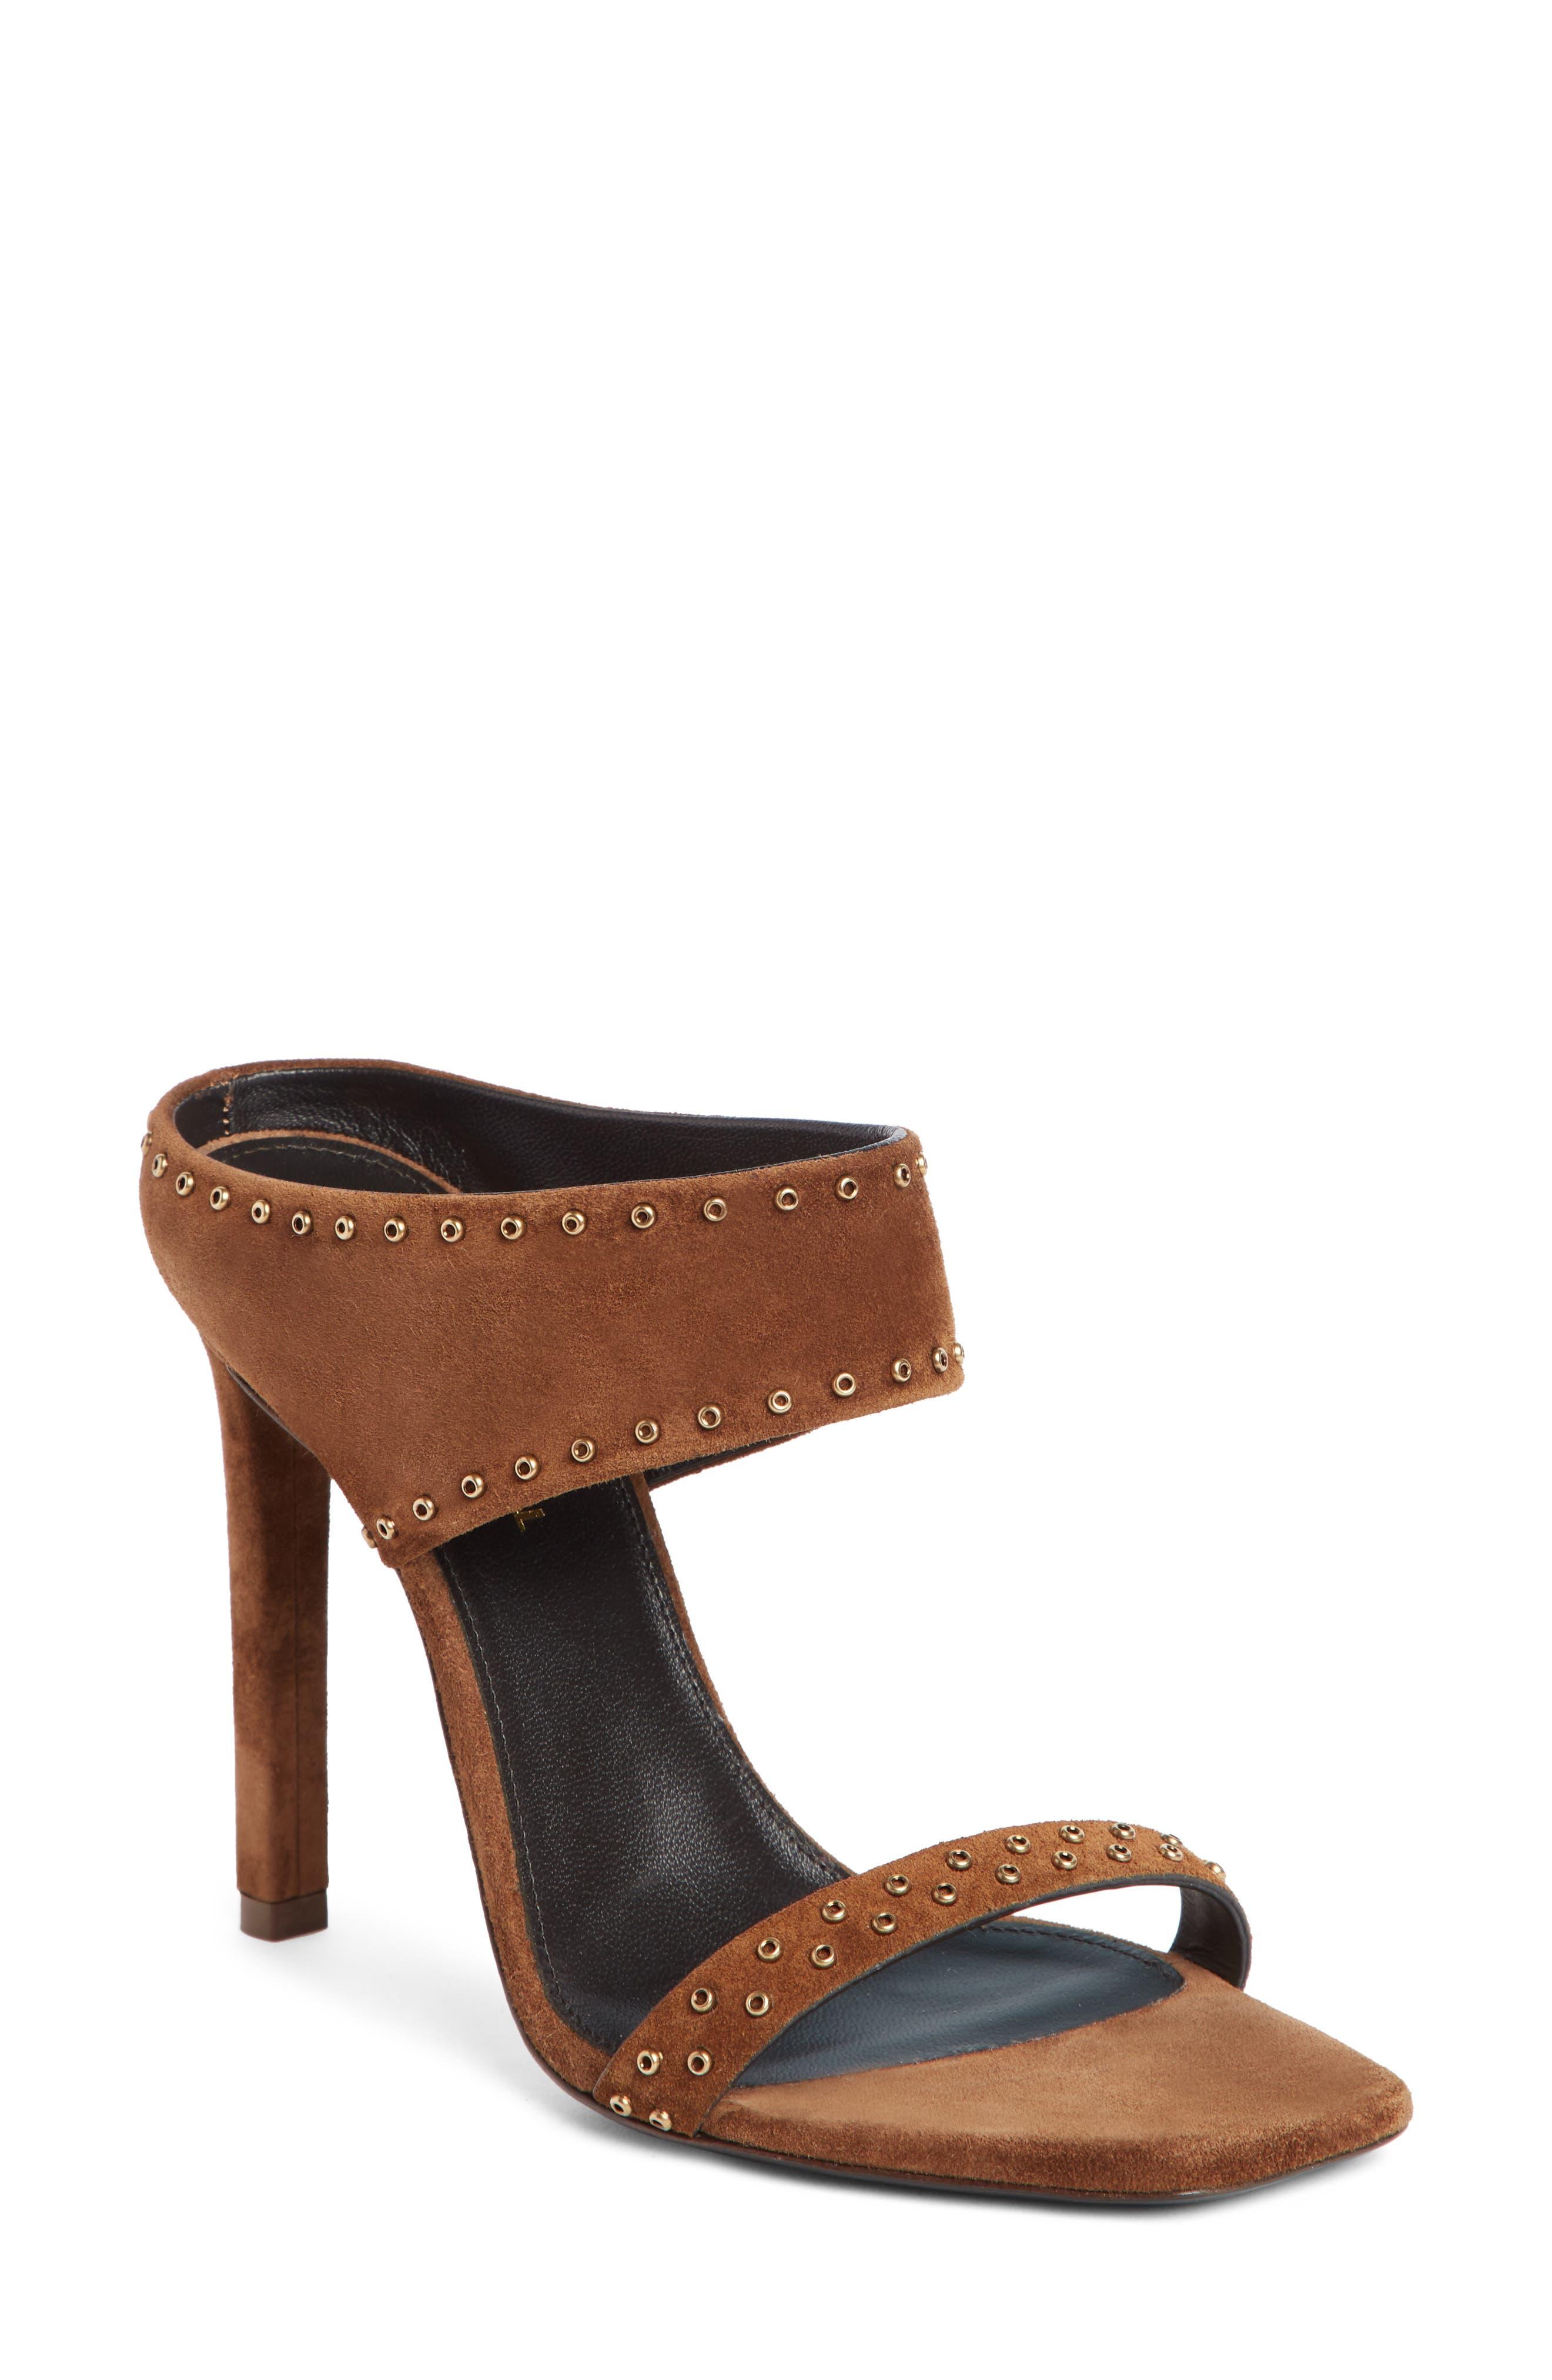 Saint Laurent Mica Grommet Slide Sandal - Brown